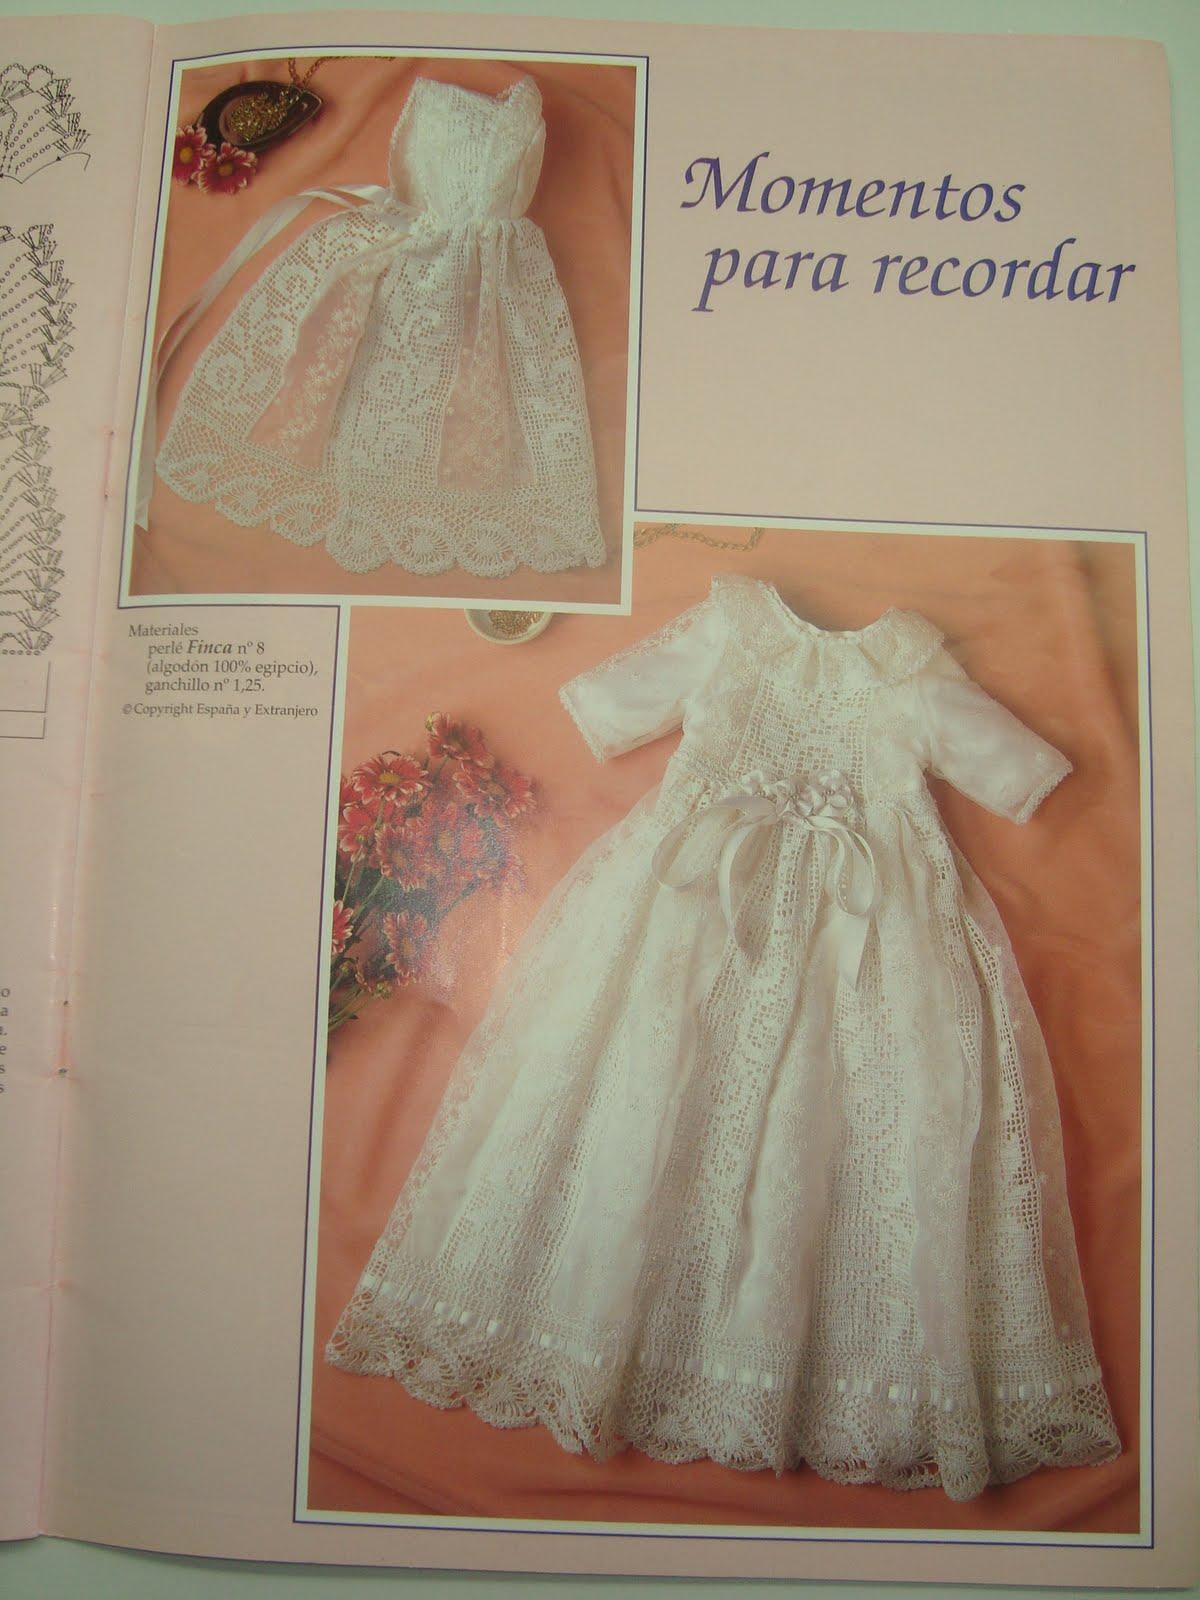 Clarita 2 hija de el tamalero - 1 part 4